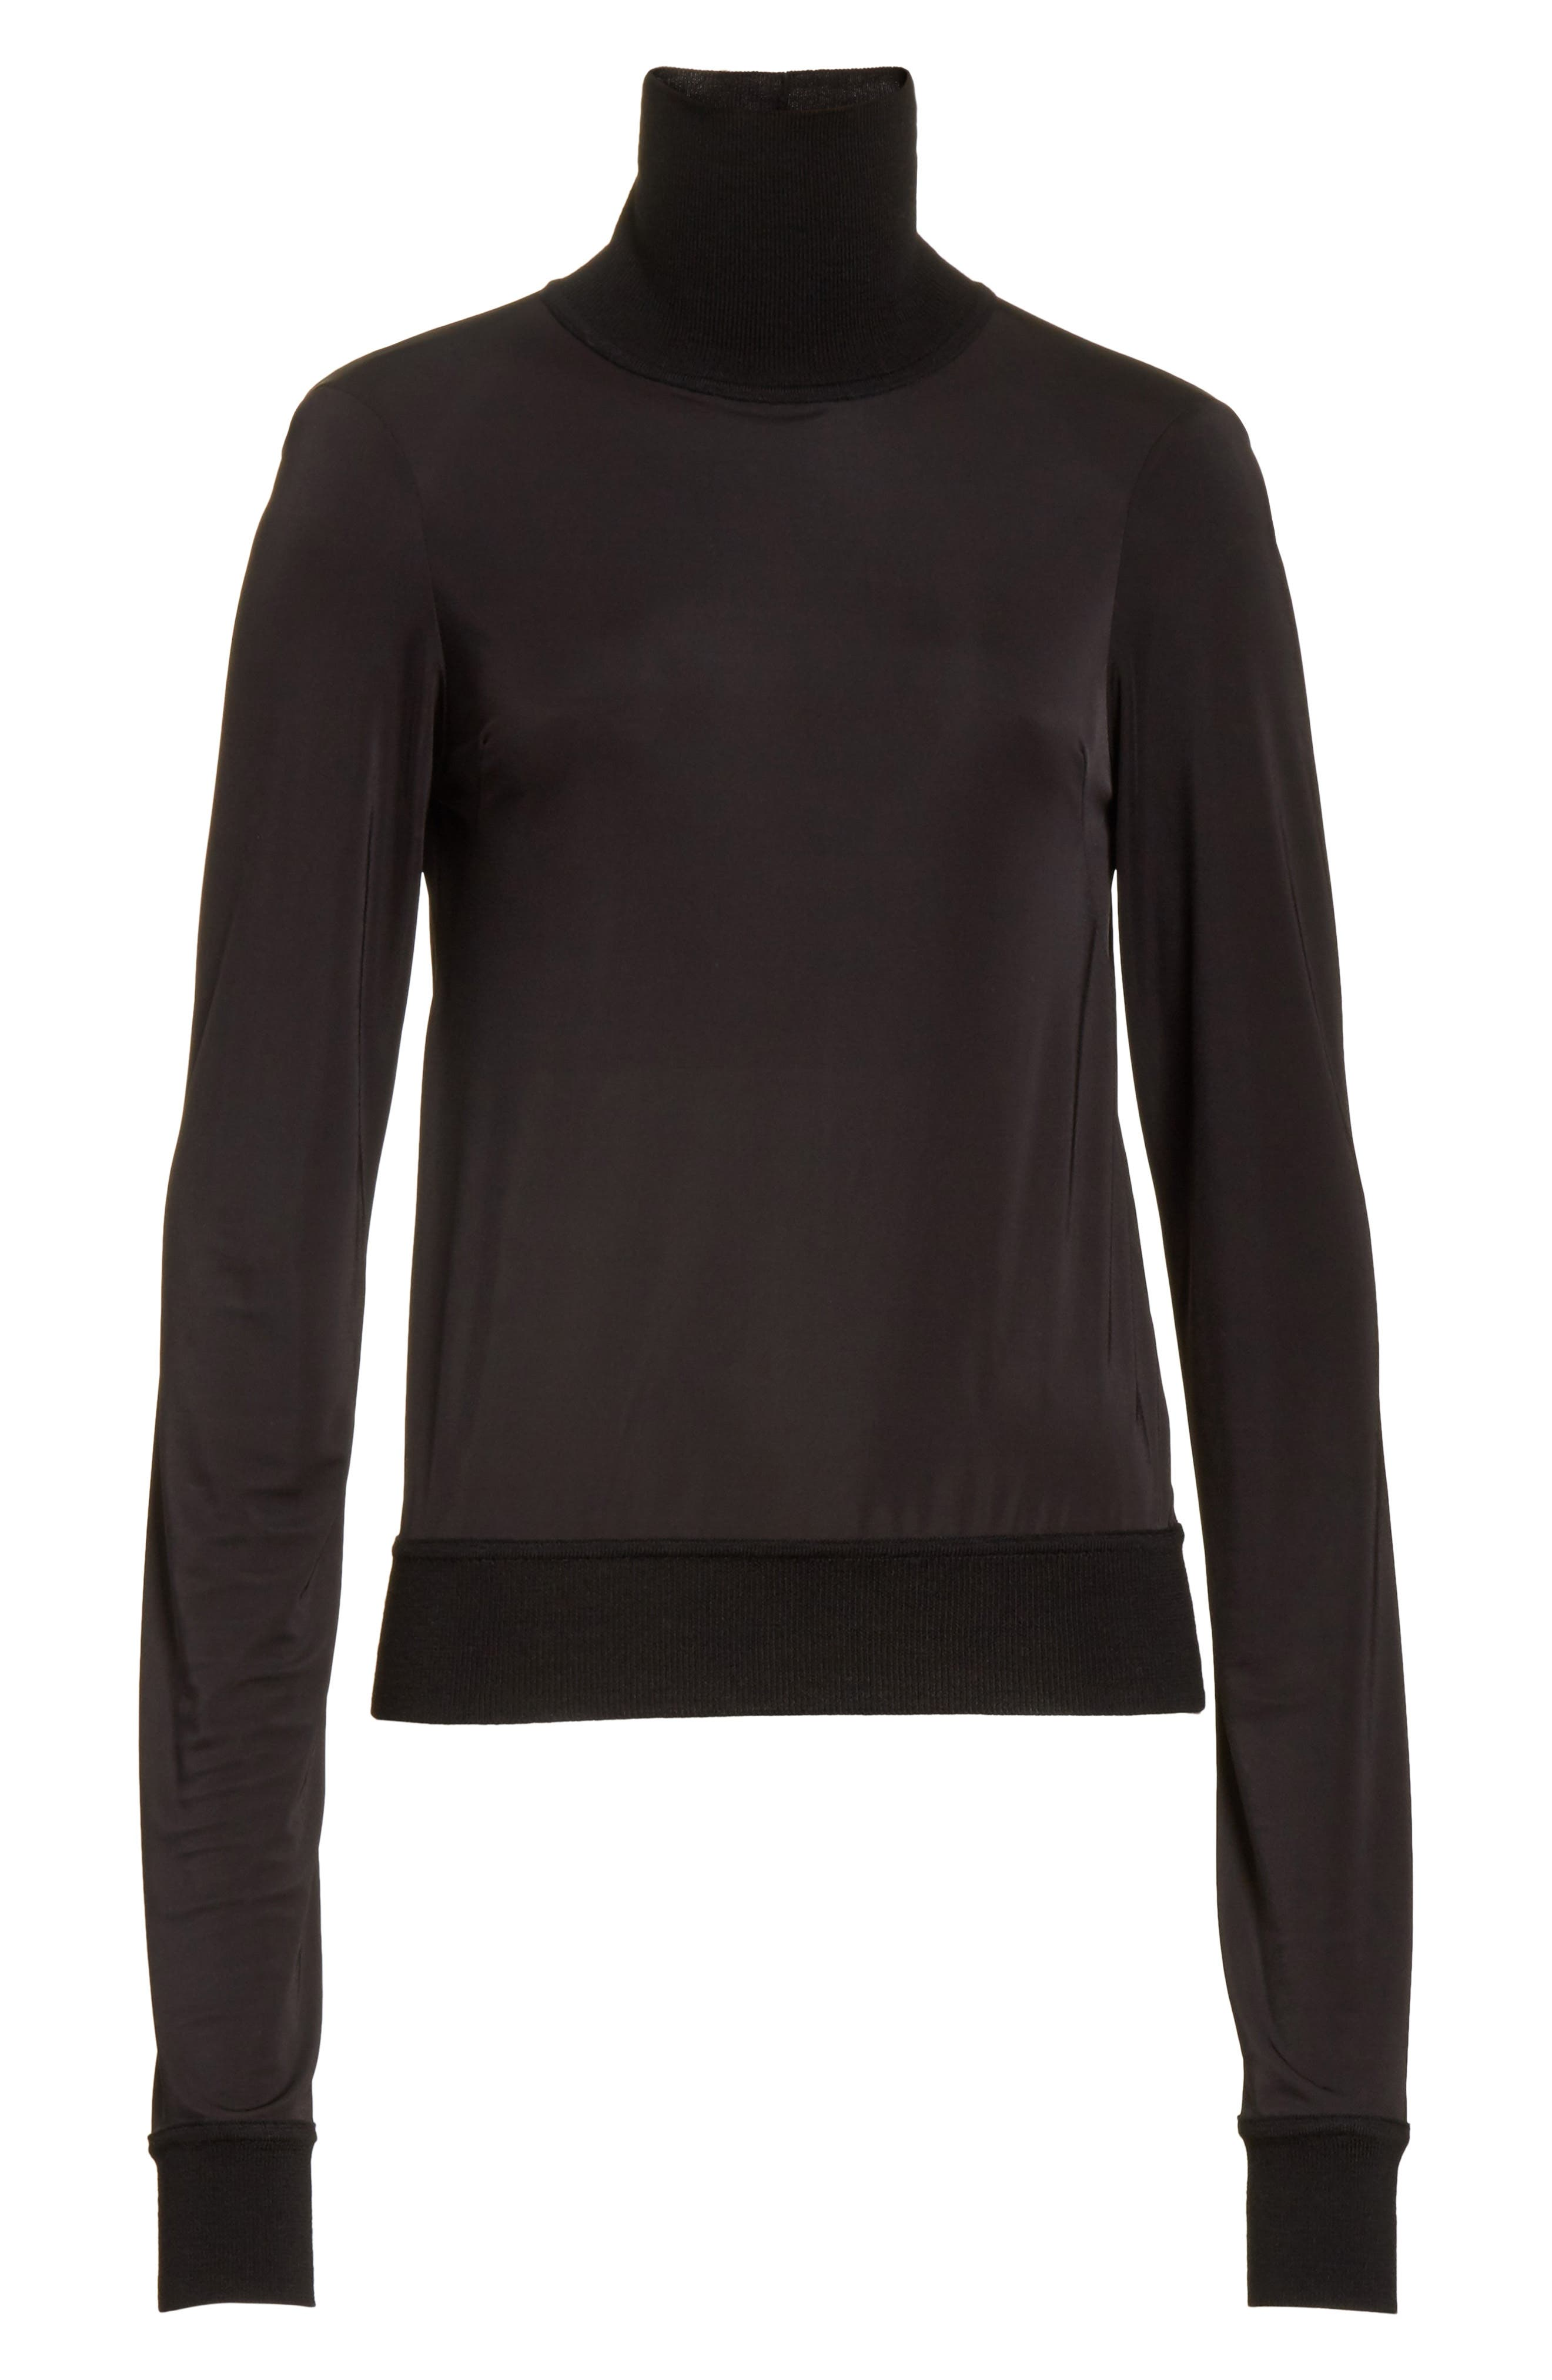 Merino Trim Turtleneck Sweater,                             Alternate thumbnail 6, color,                             Black